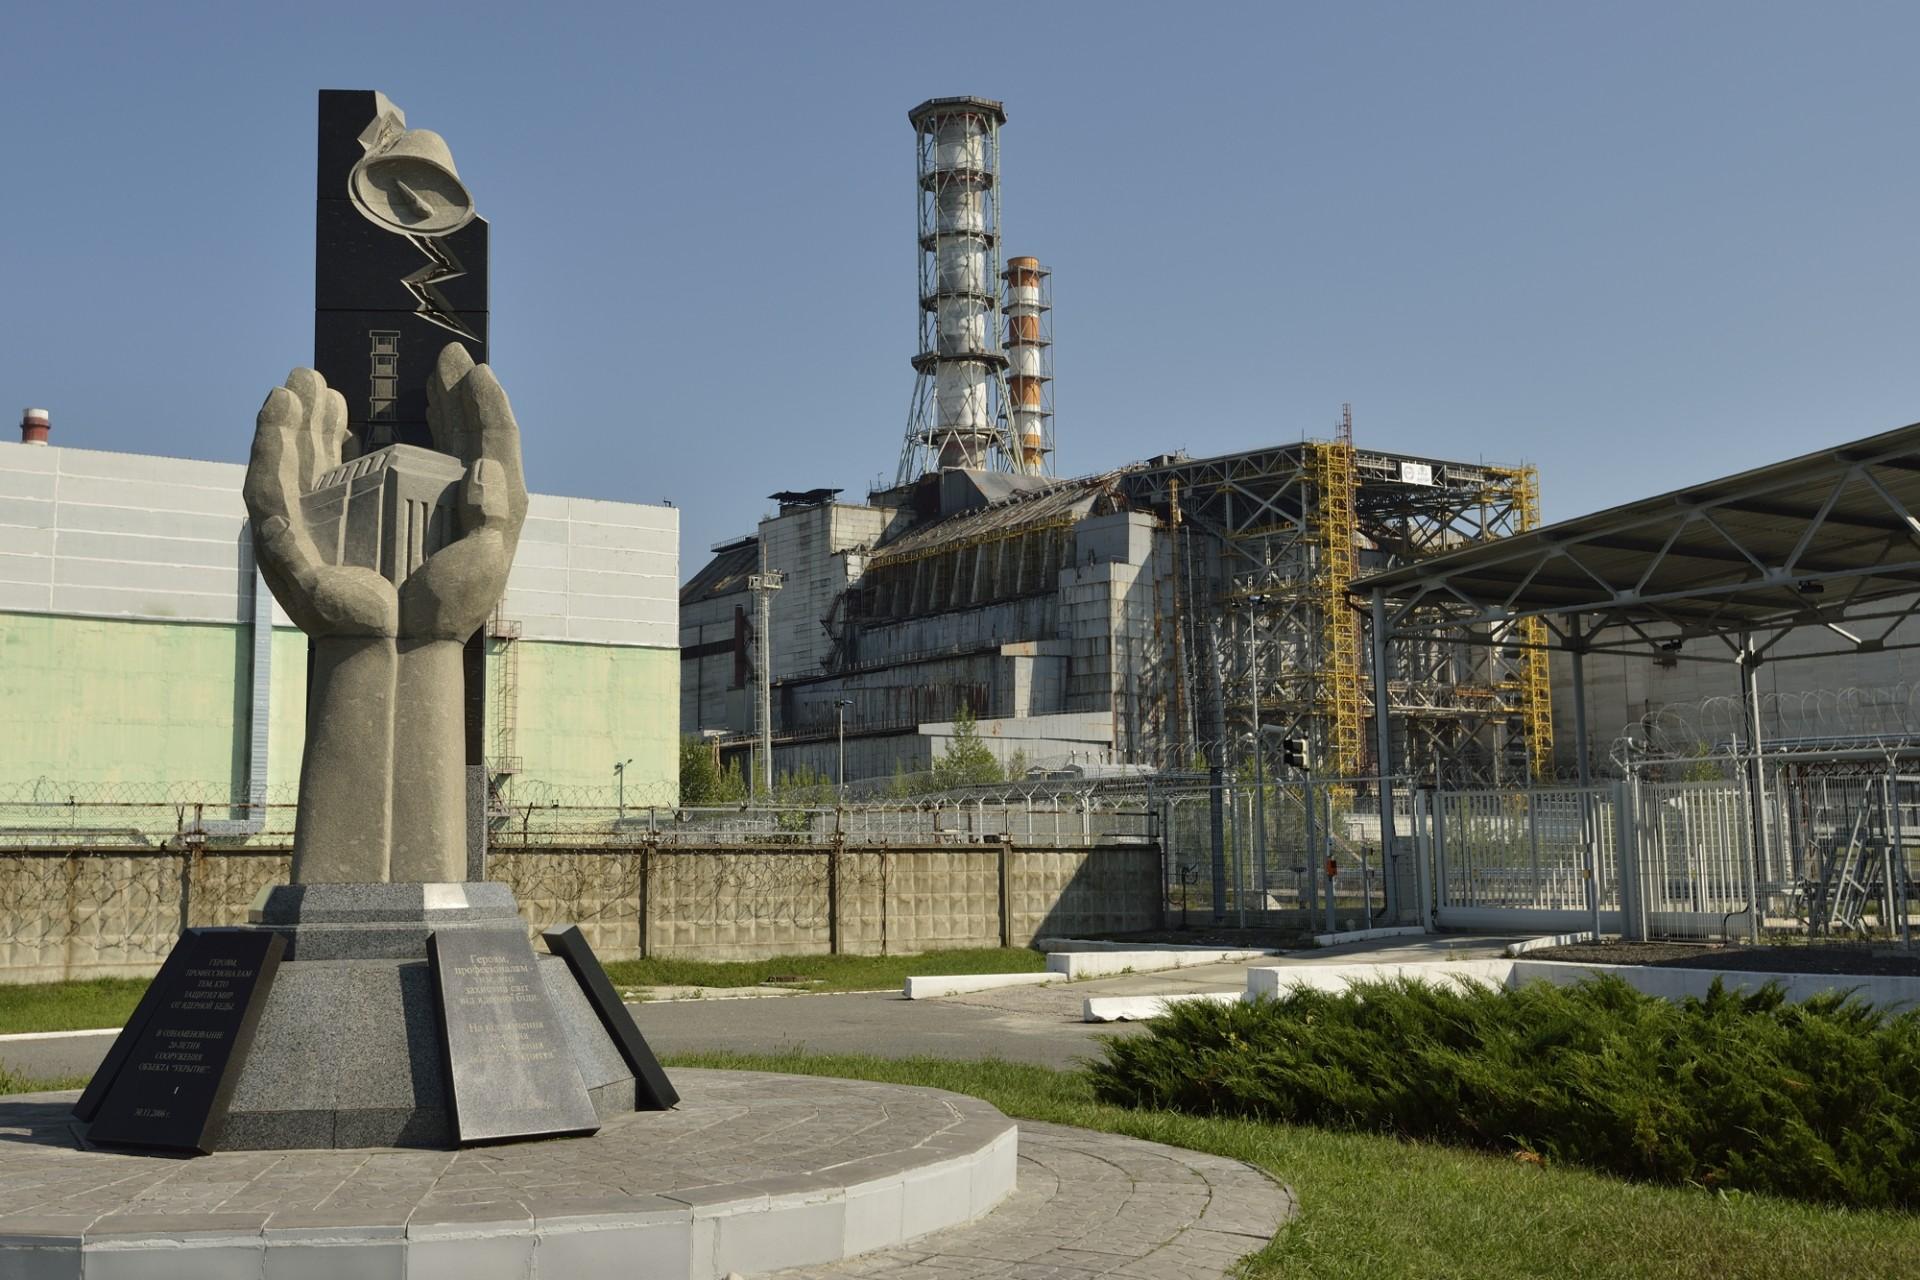 Chernobyl reactor #4